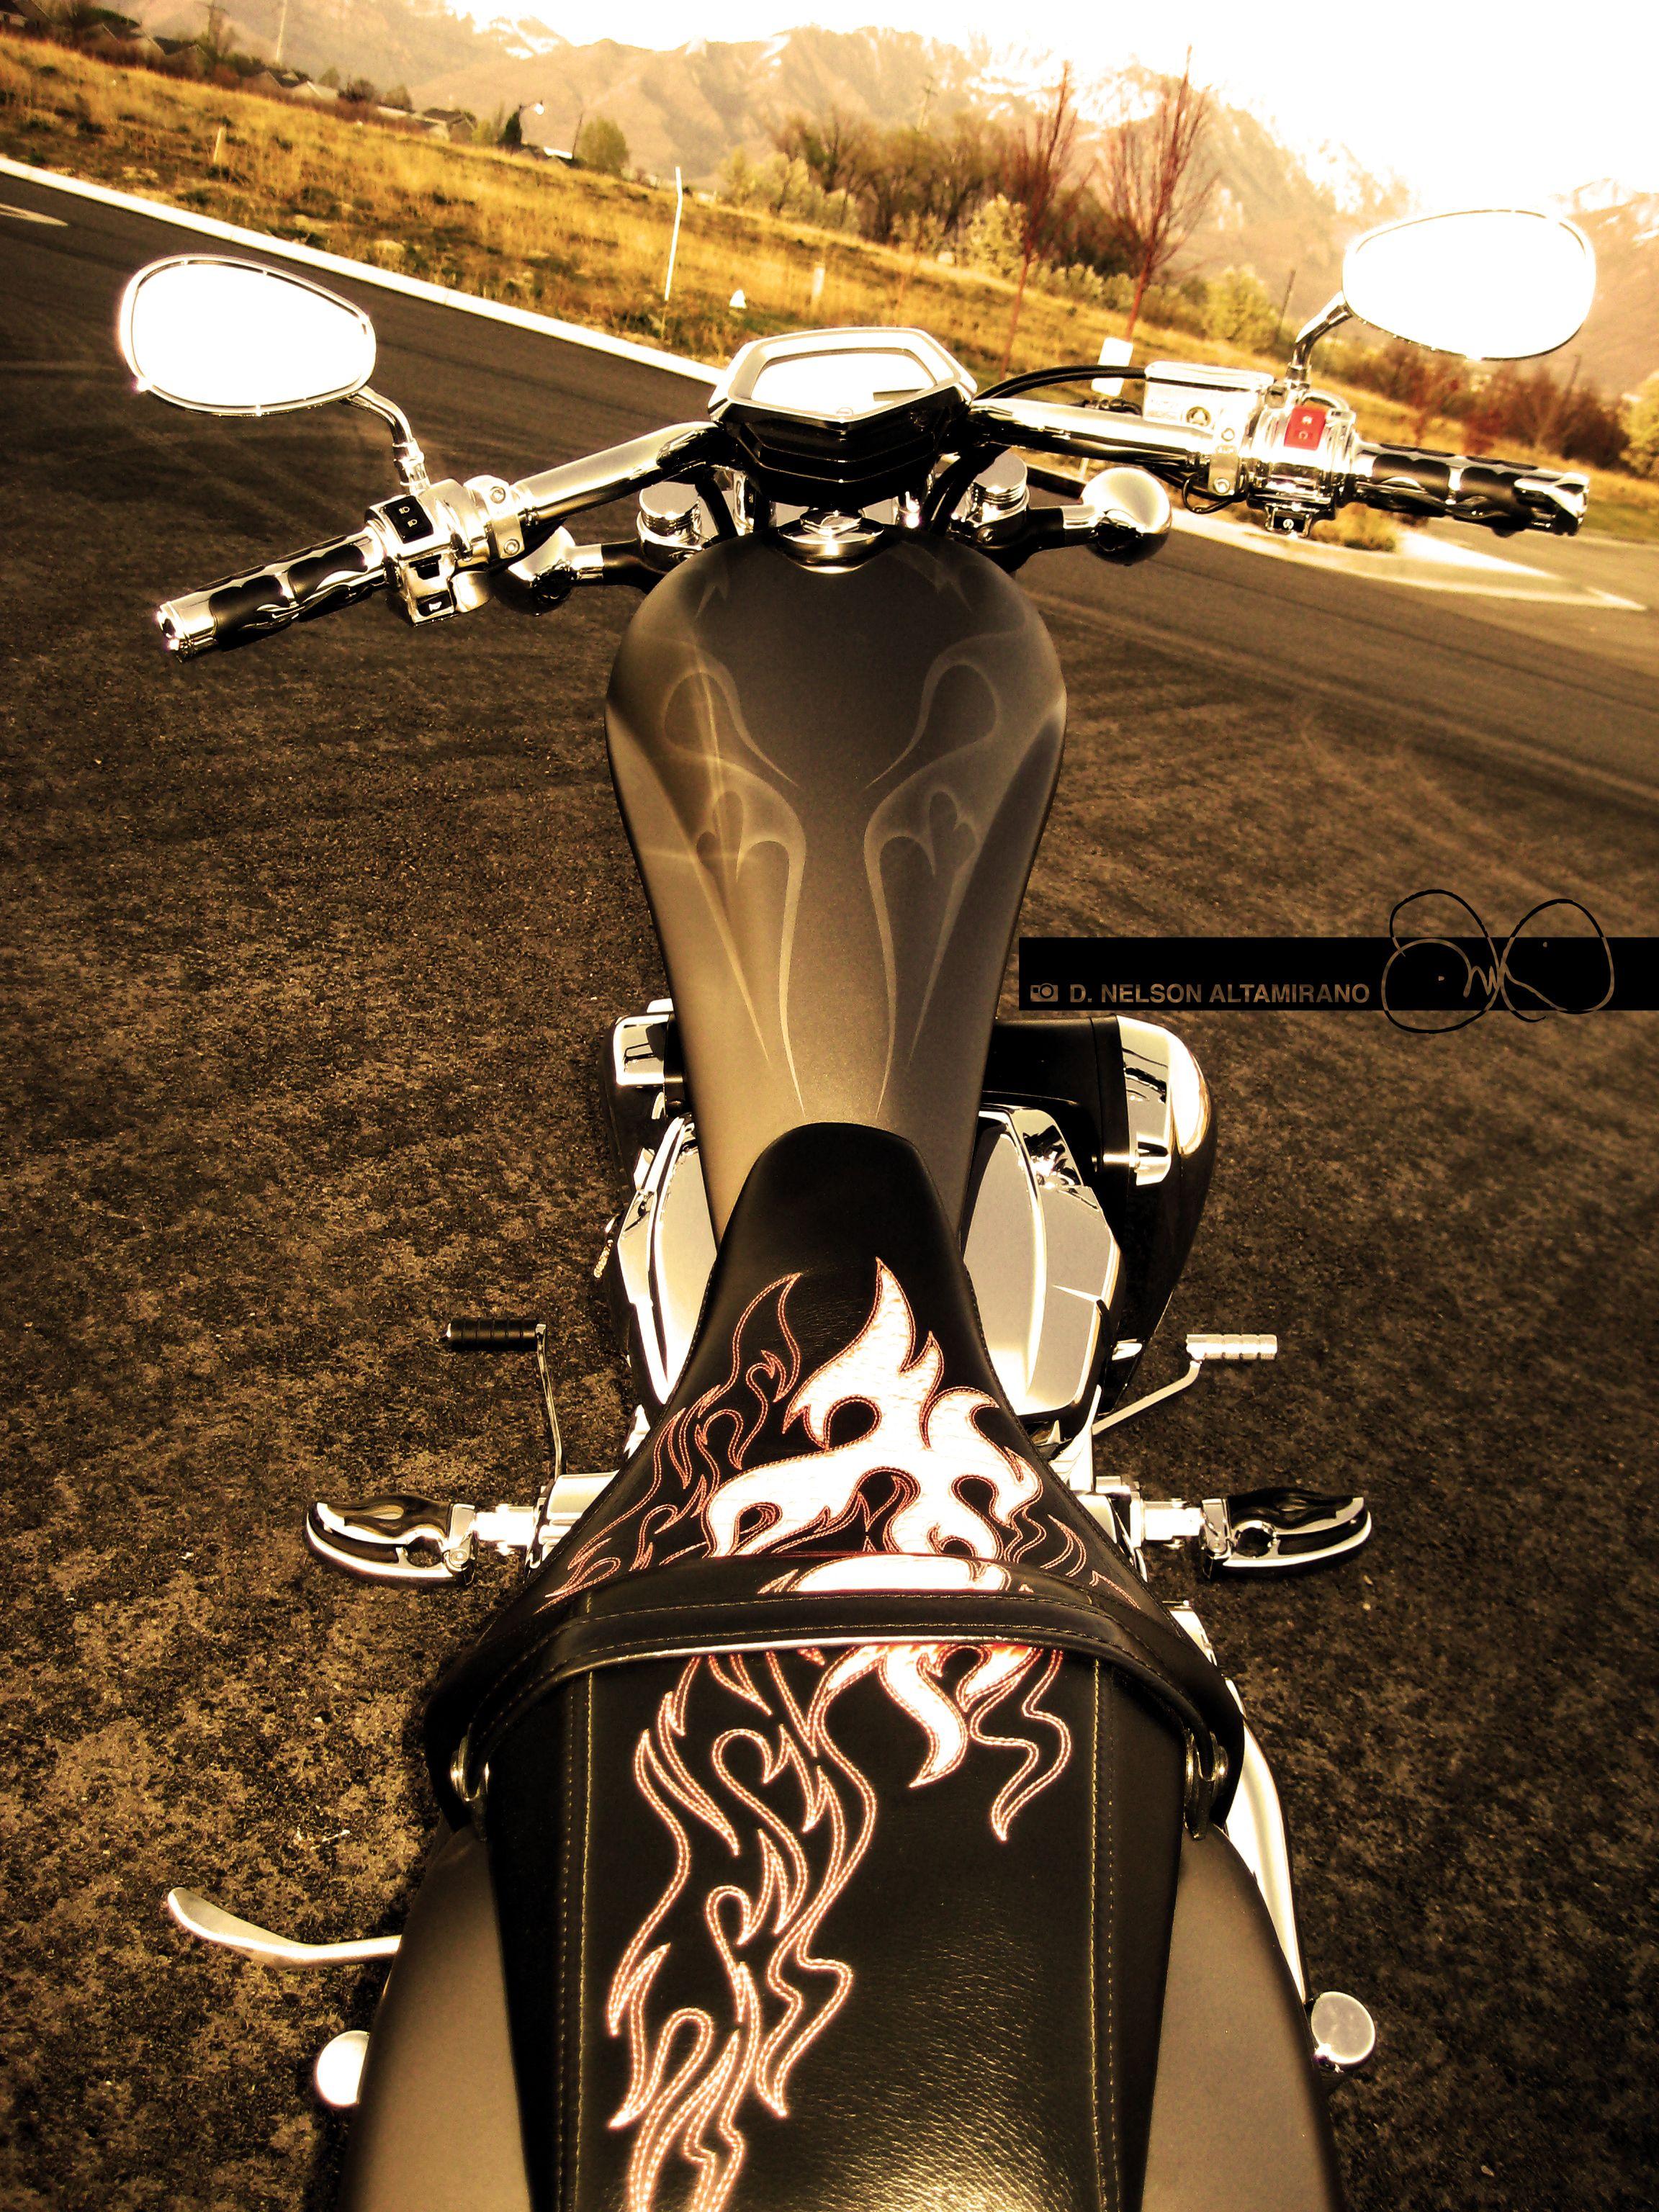 Motorcycle Honda Fury For sale